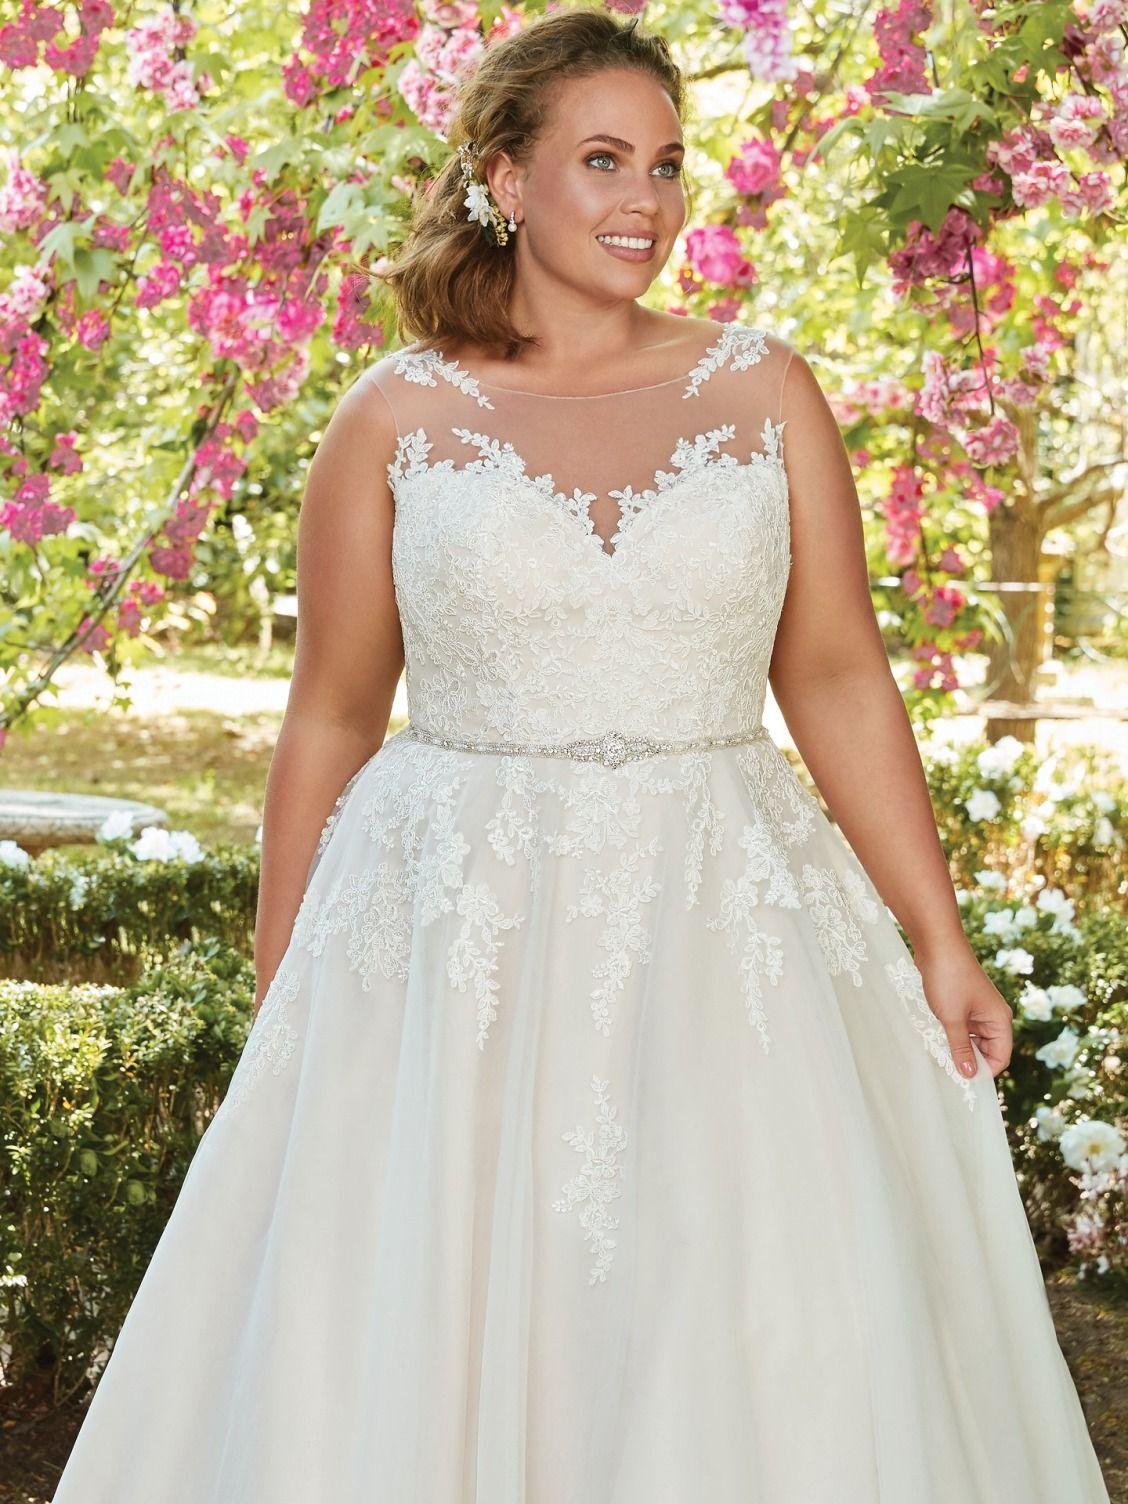 Olivia by rebecca ingram wedding dresses wedding dresses